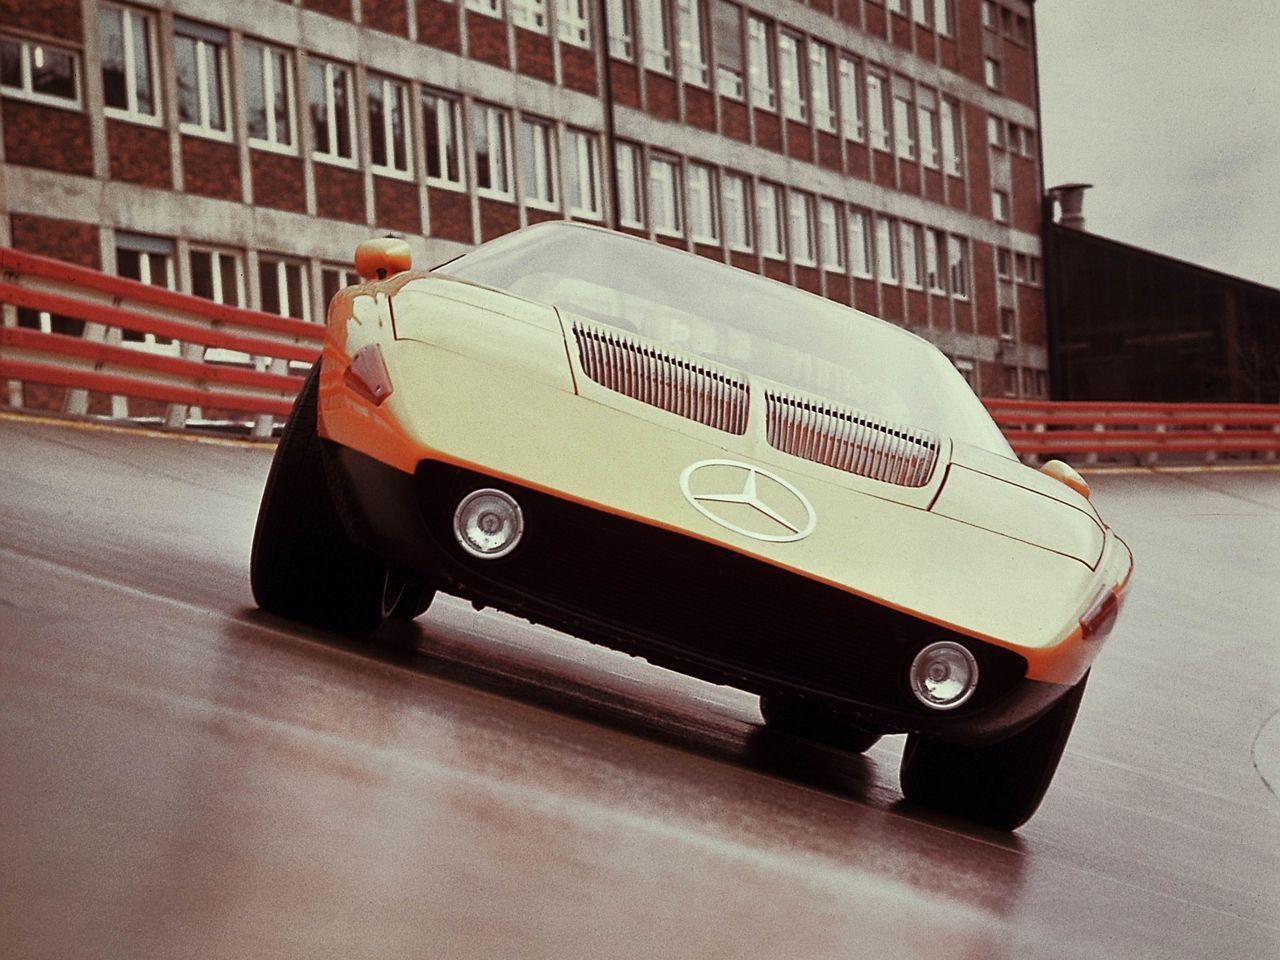 Mercedes benz 280sl car vehicl wrap mercedes benz merced pagoda - 1970 Mercedes Benz C111 Www Luxuryaddicted Com